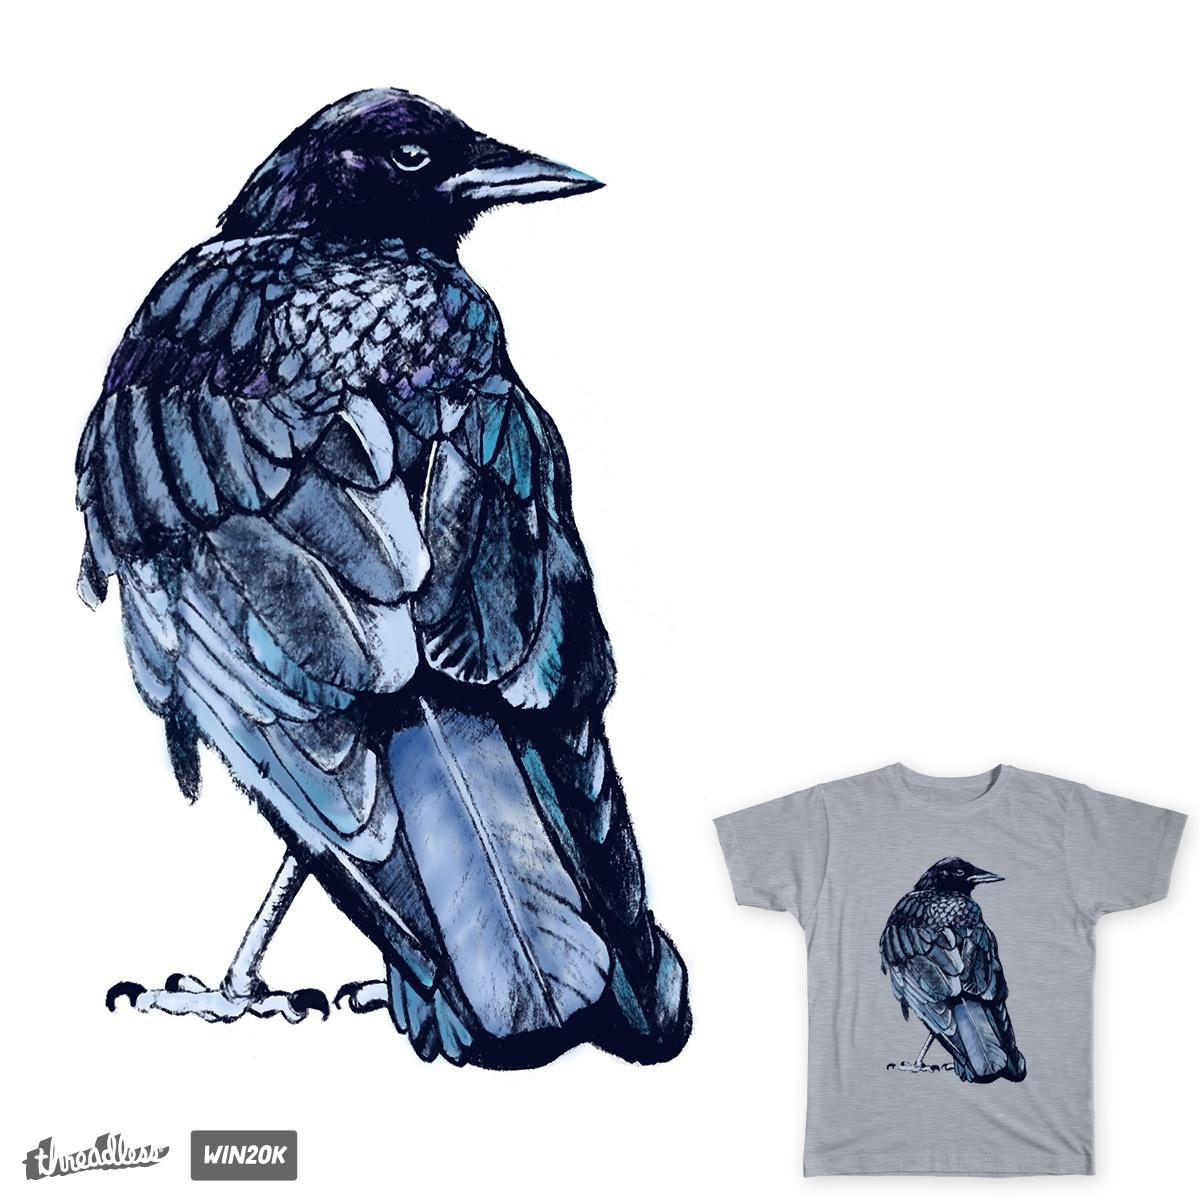 Dirty Crow by DettaT on Threadless